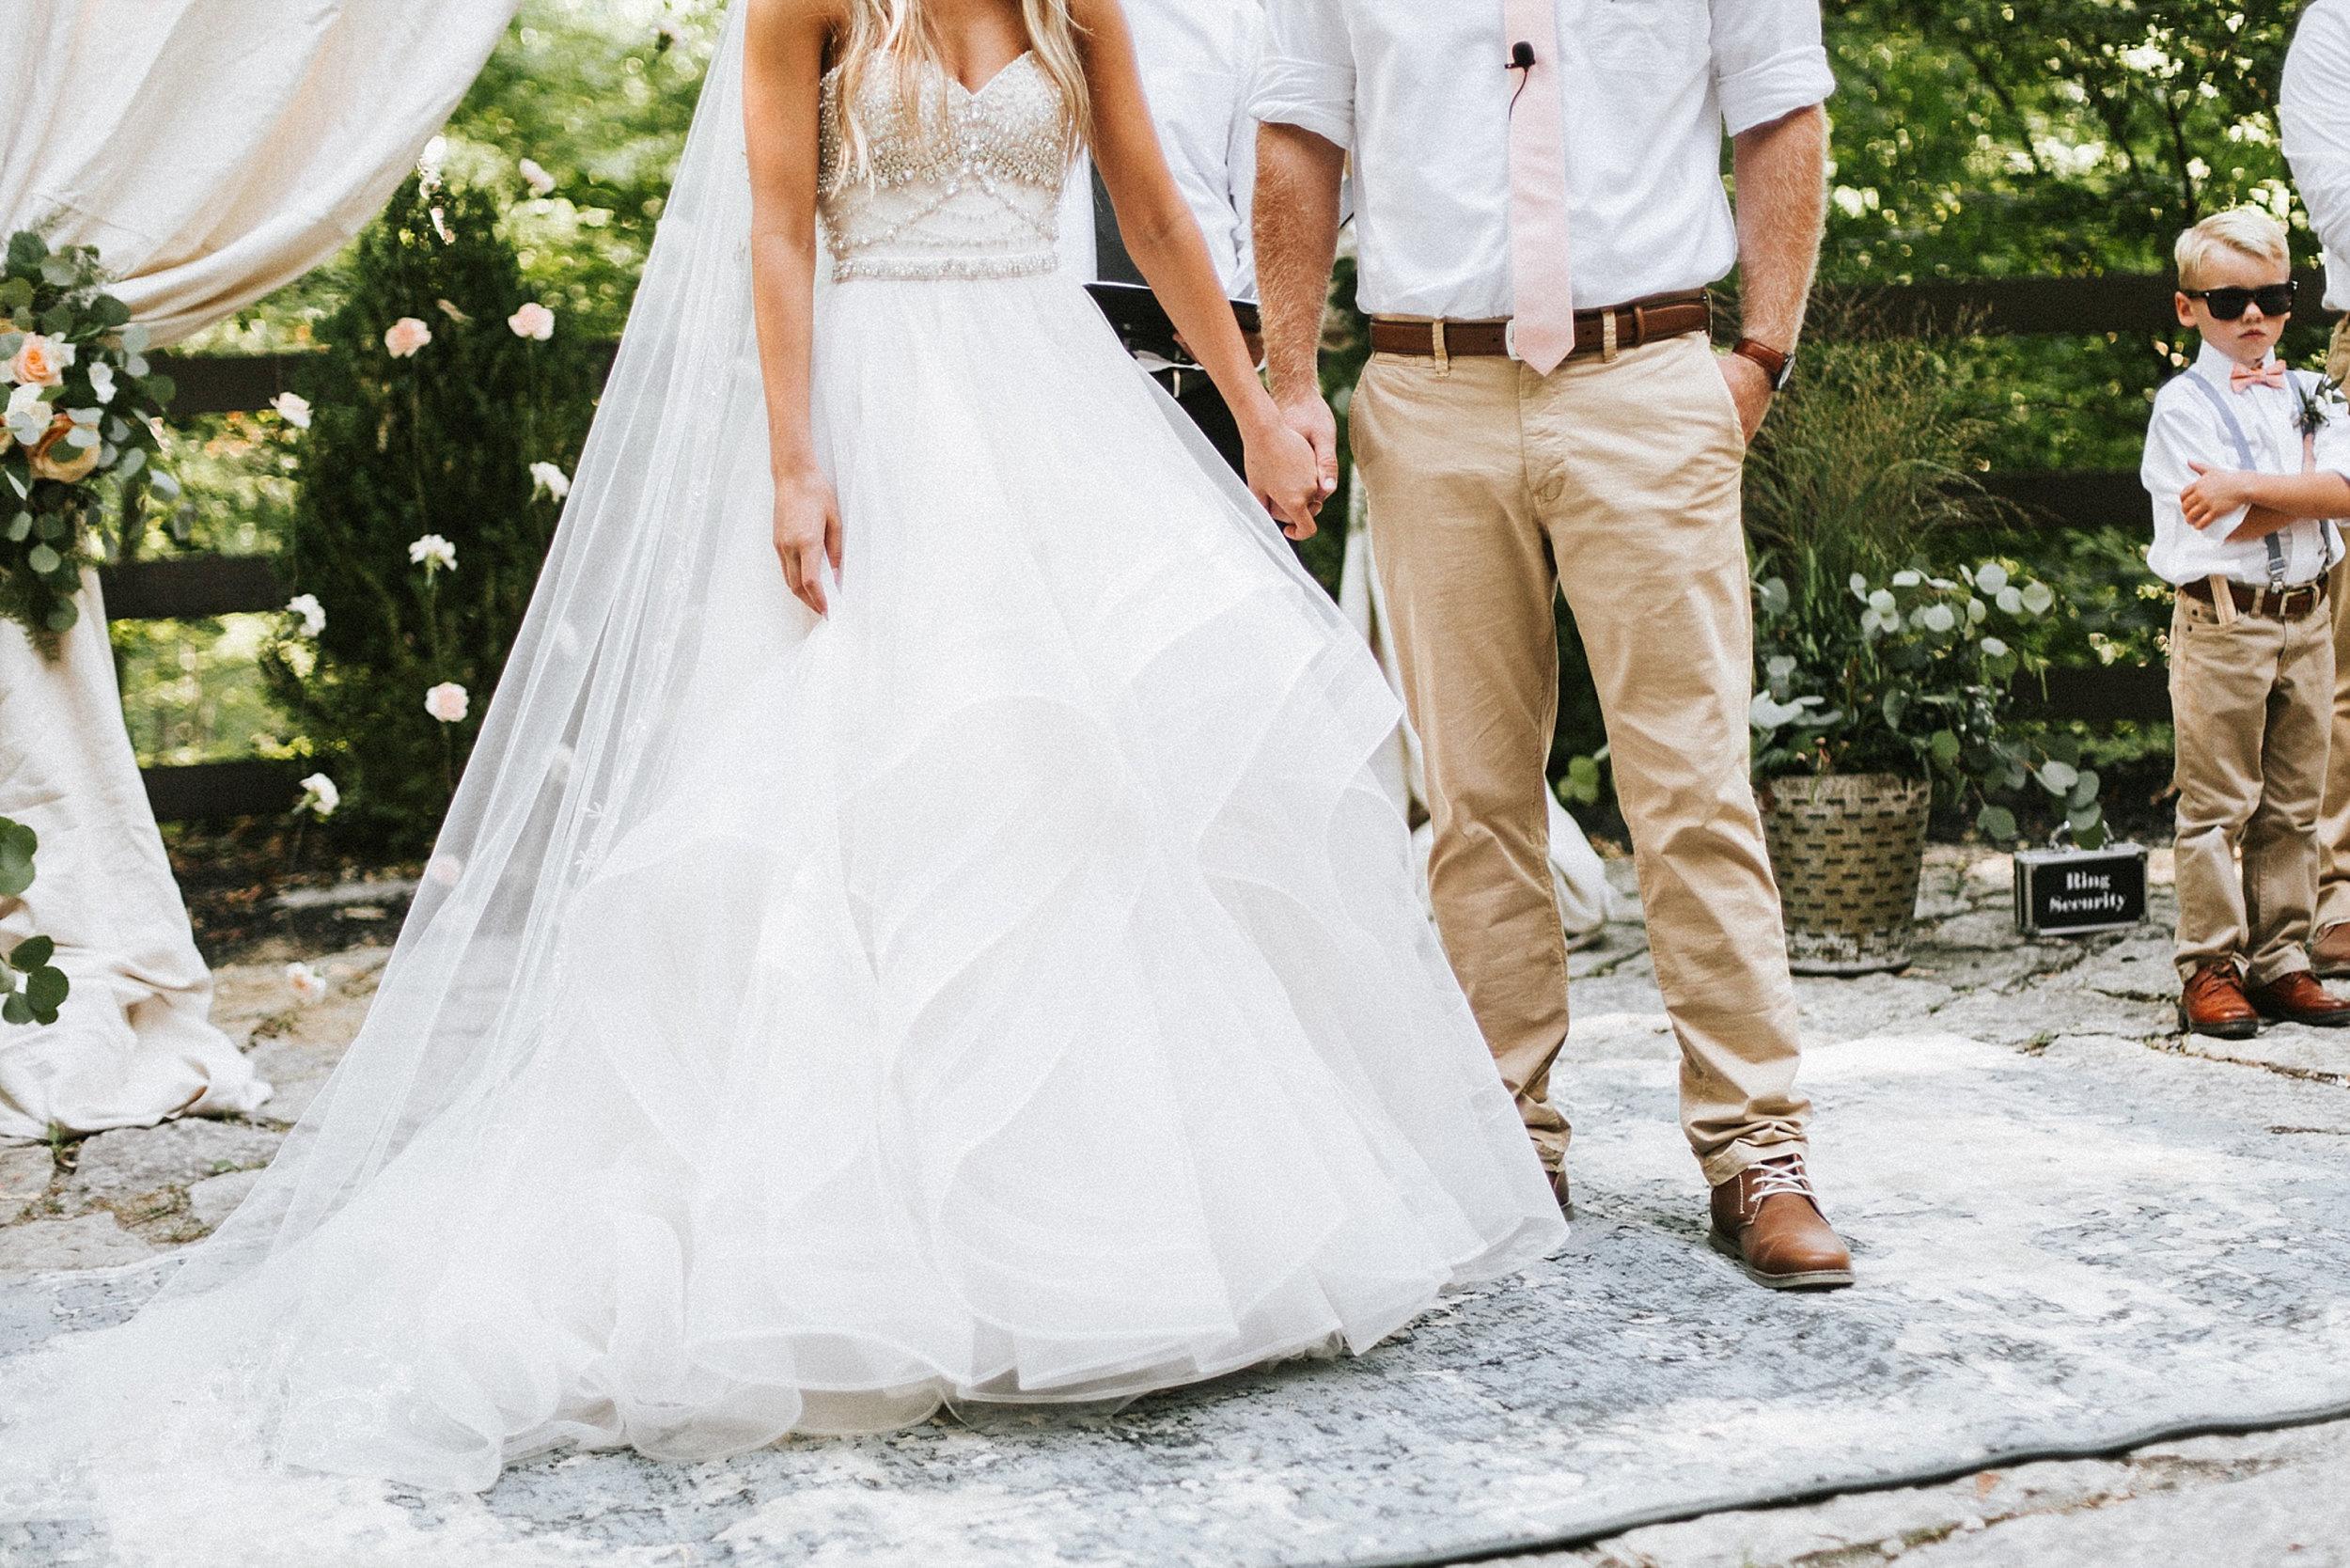 Brooke Townsend Photography - Cincinnati Wedding Photographer (75 of 153).jpg